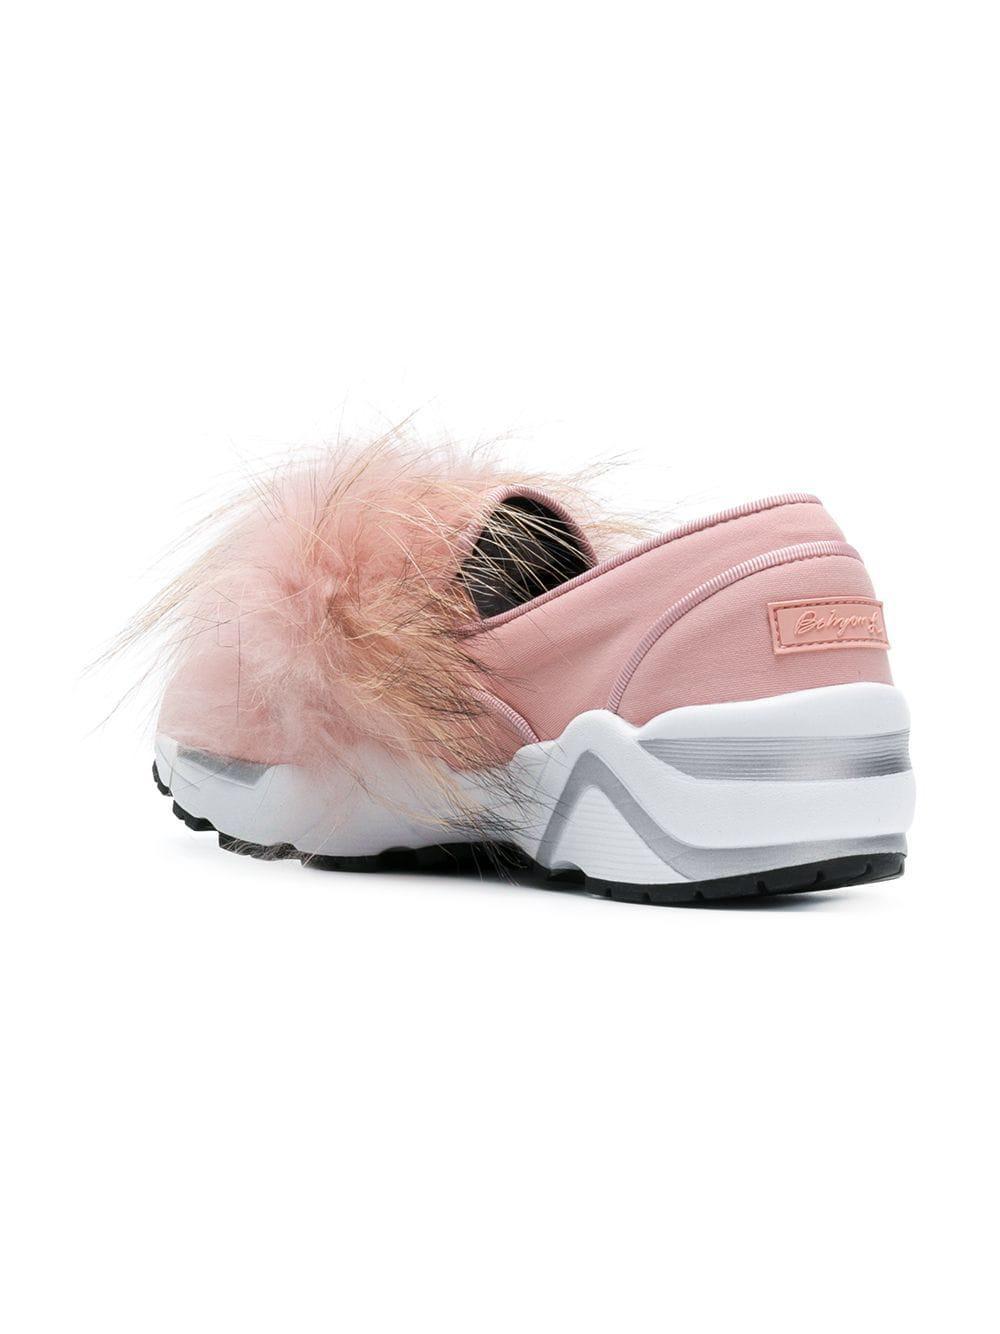 Suecomma Bonnie Neoprene Pink Real Fur Trim Slip-on Sneakers